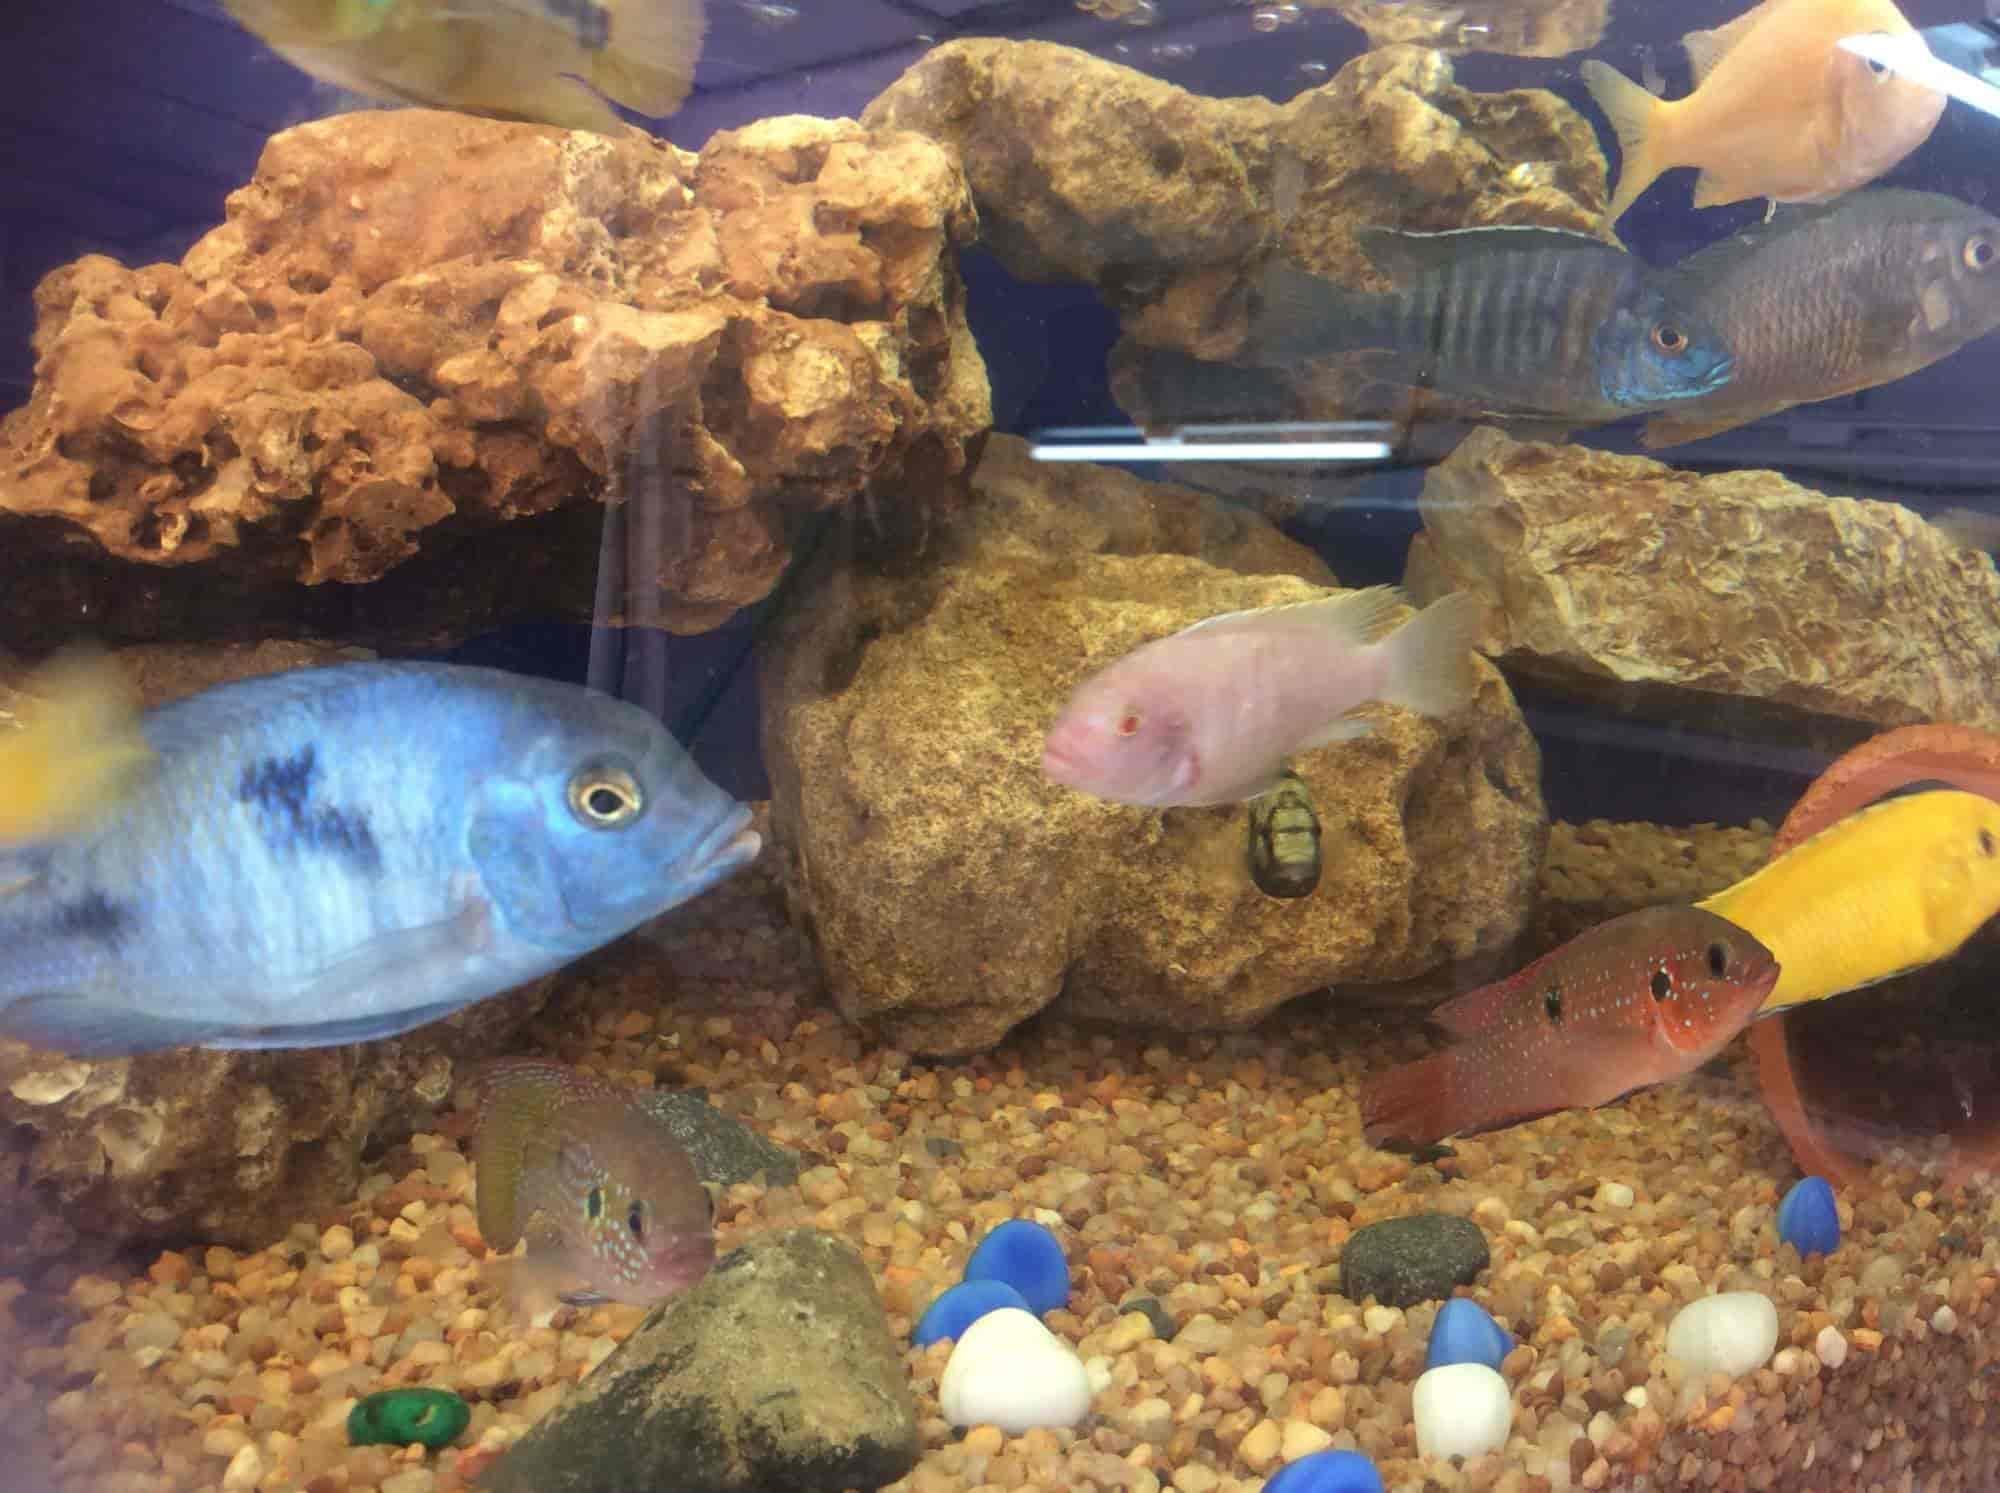 Naaf Aqua Farm Kolathur Aquarium Fish Dealers In Chennai Justdial